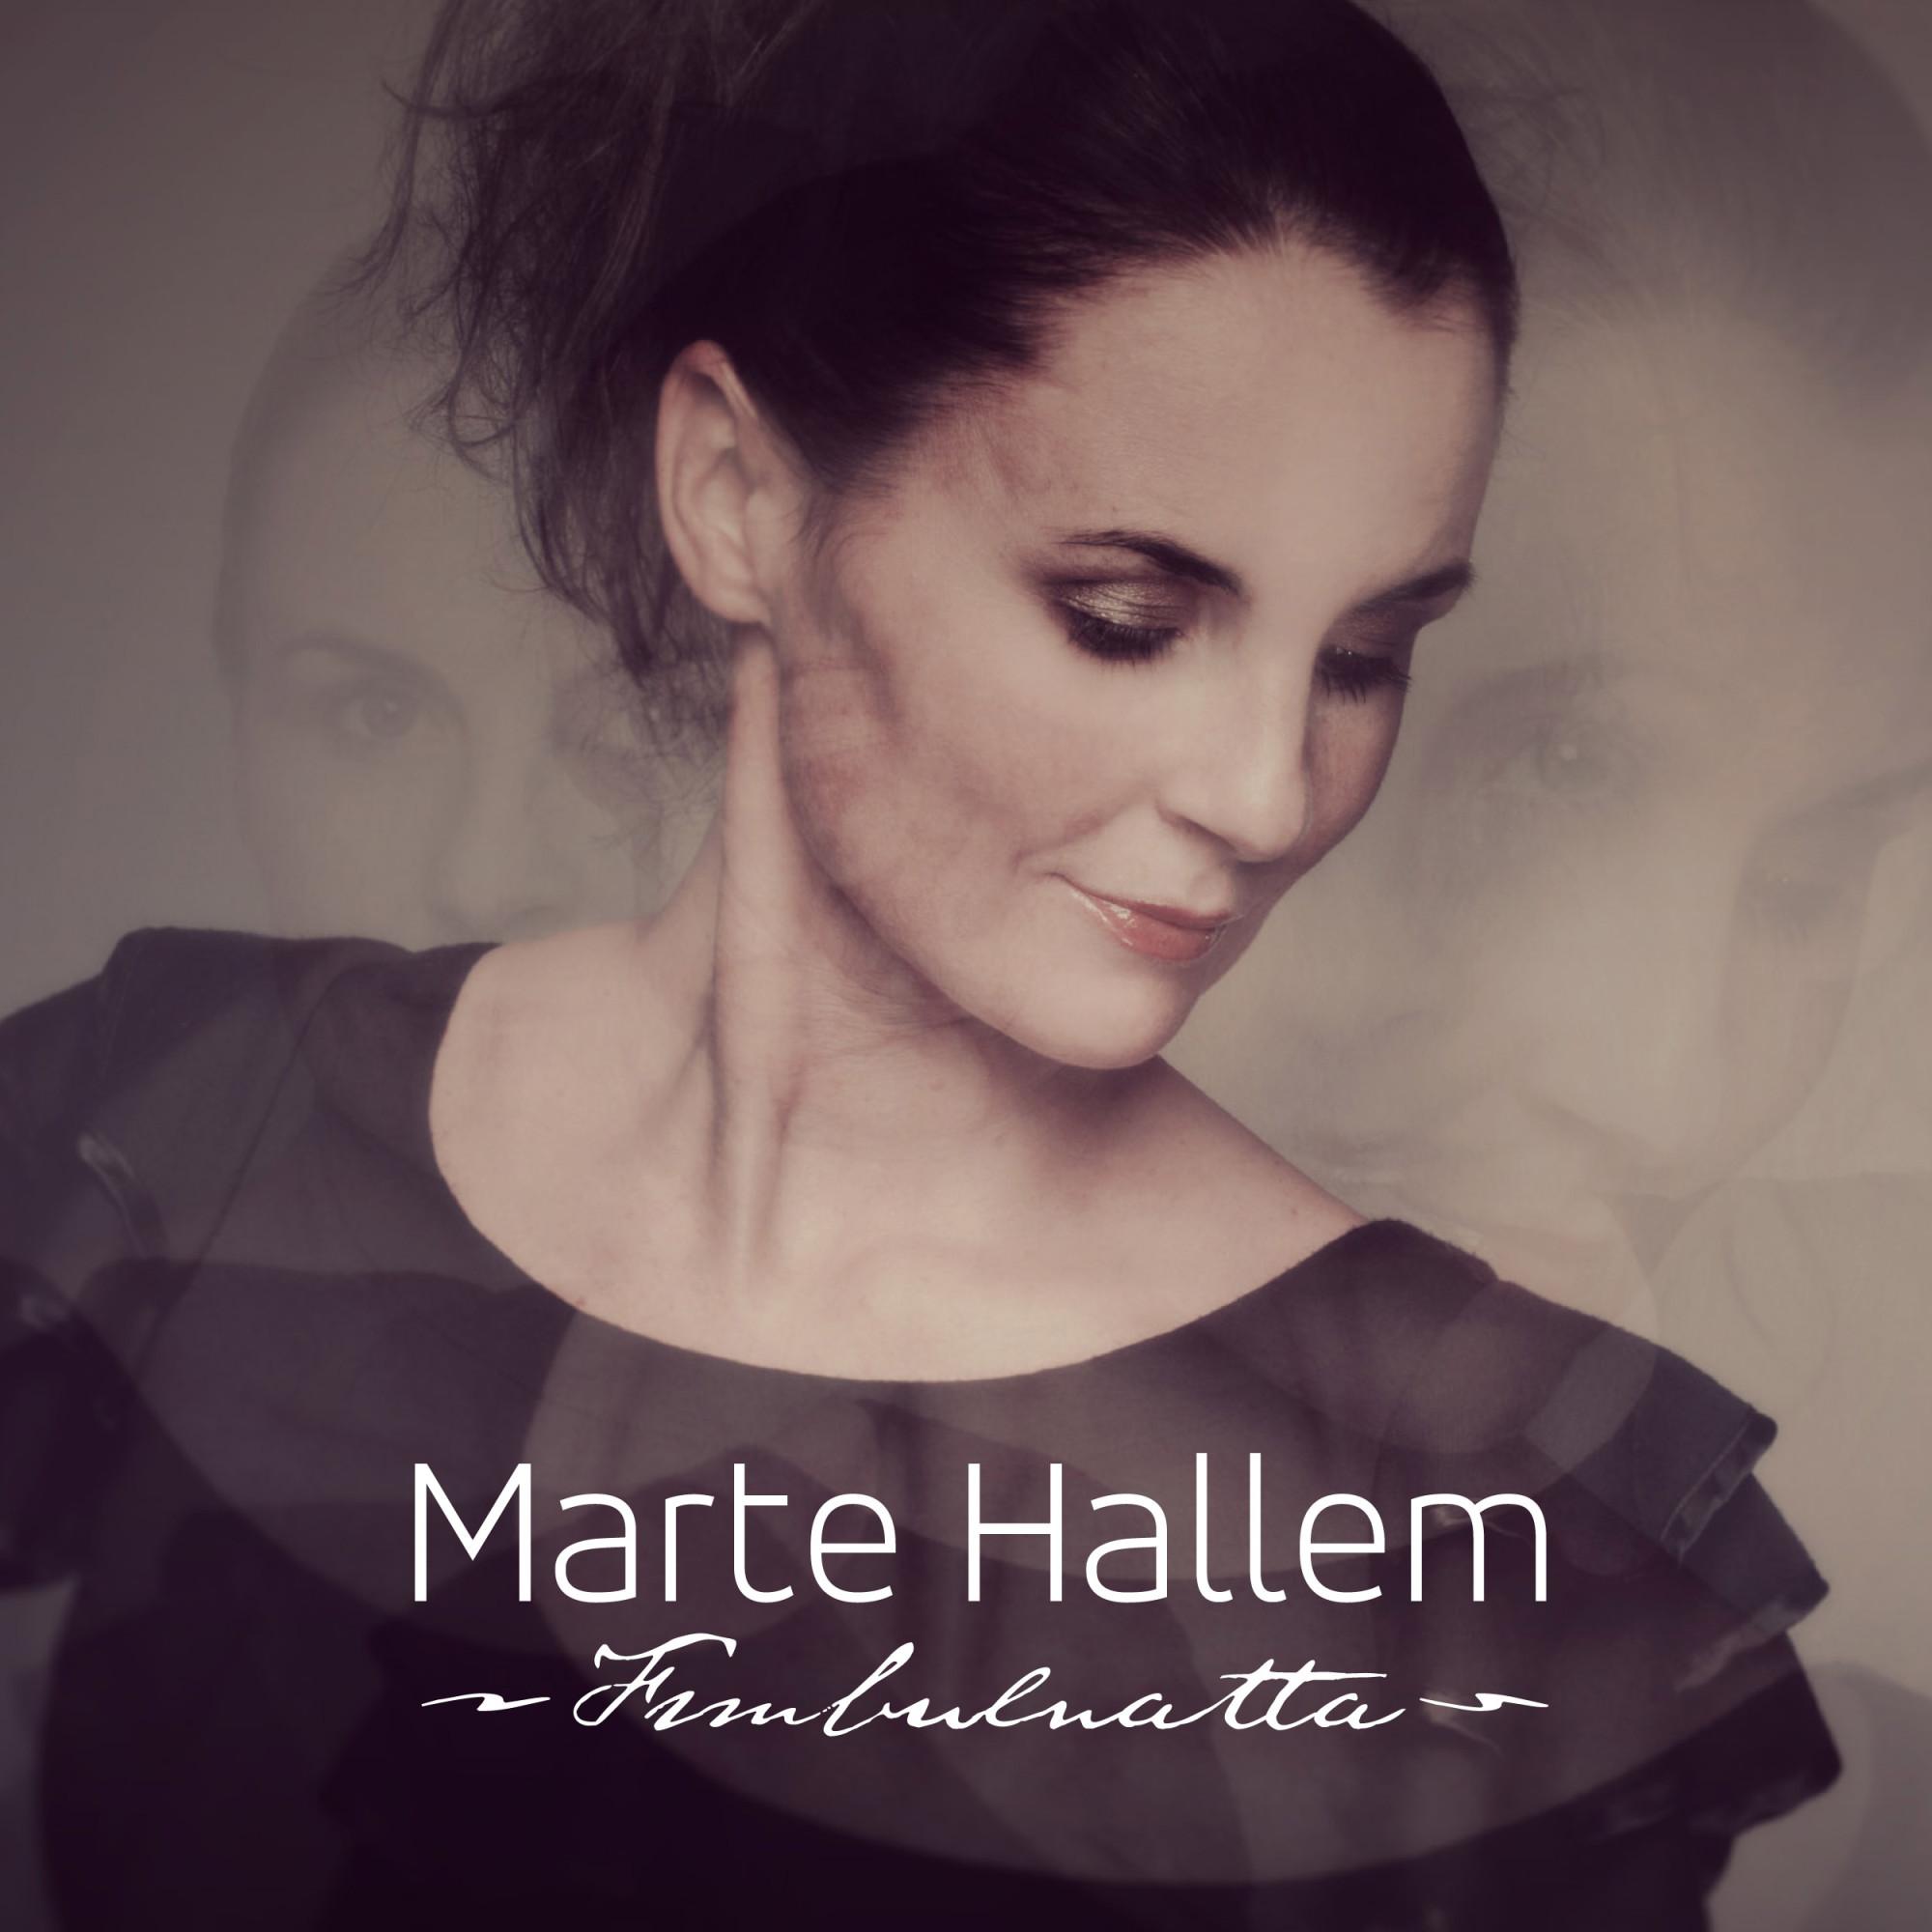 Marte Hallem - Fimbulnatta